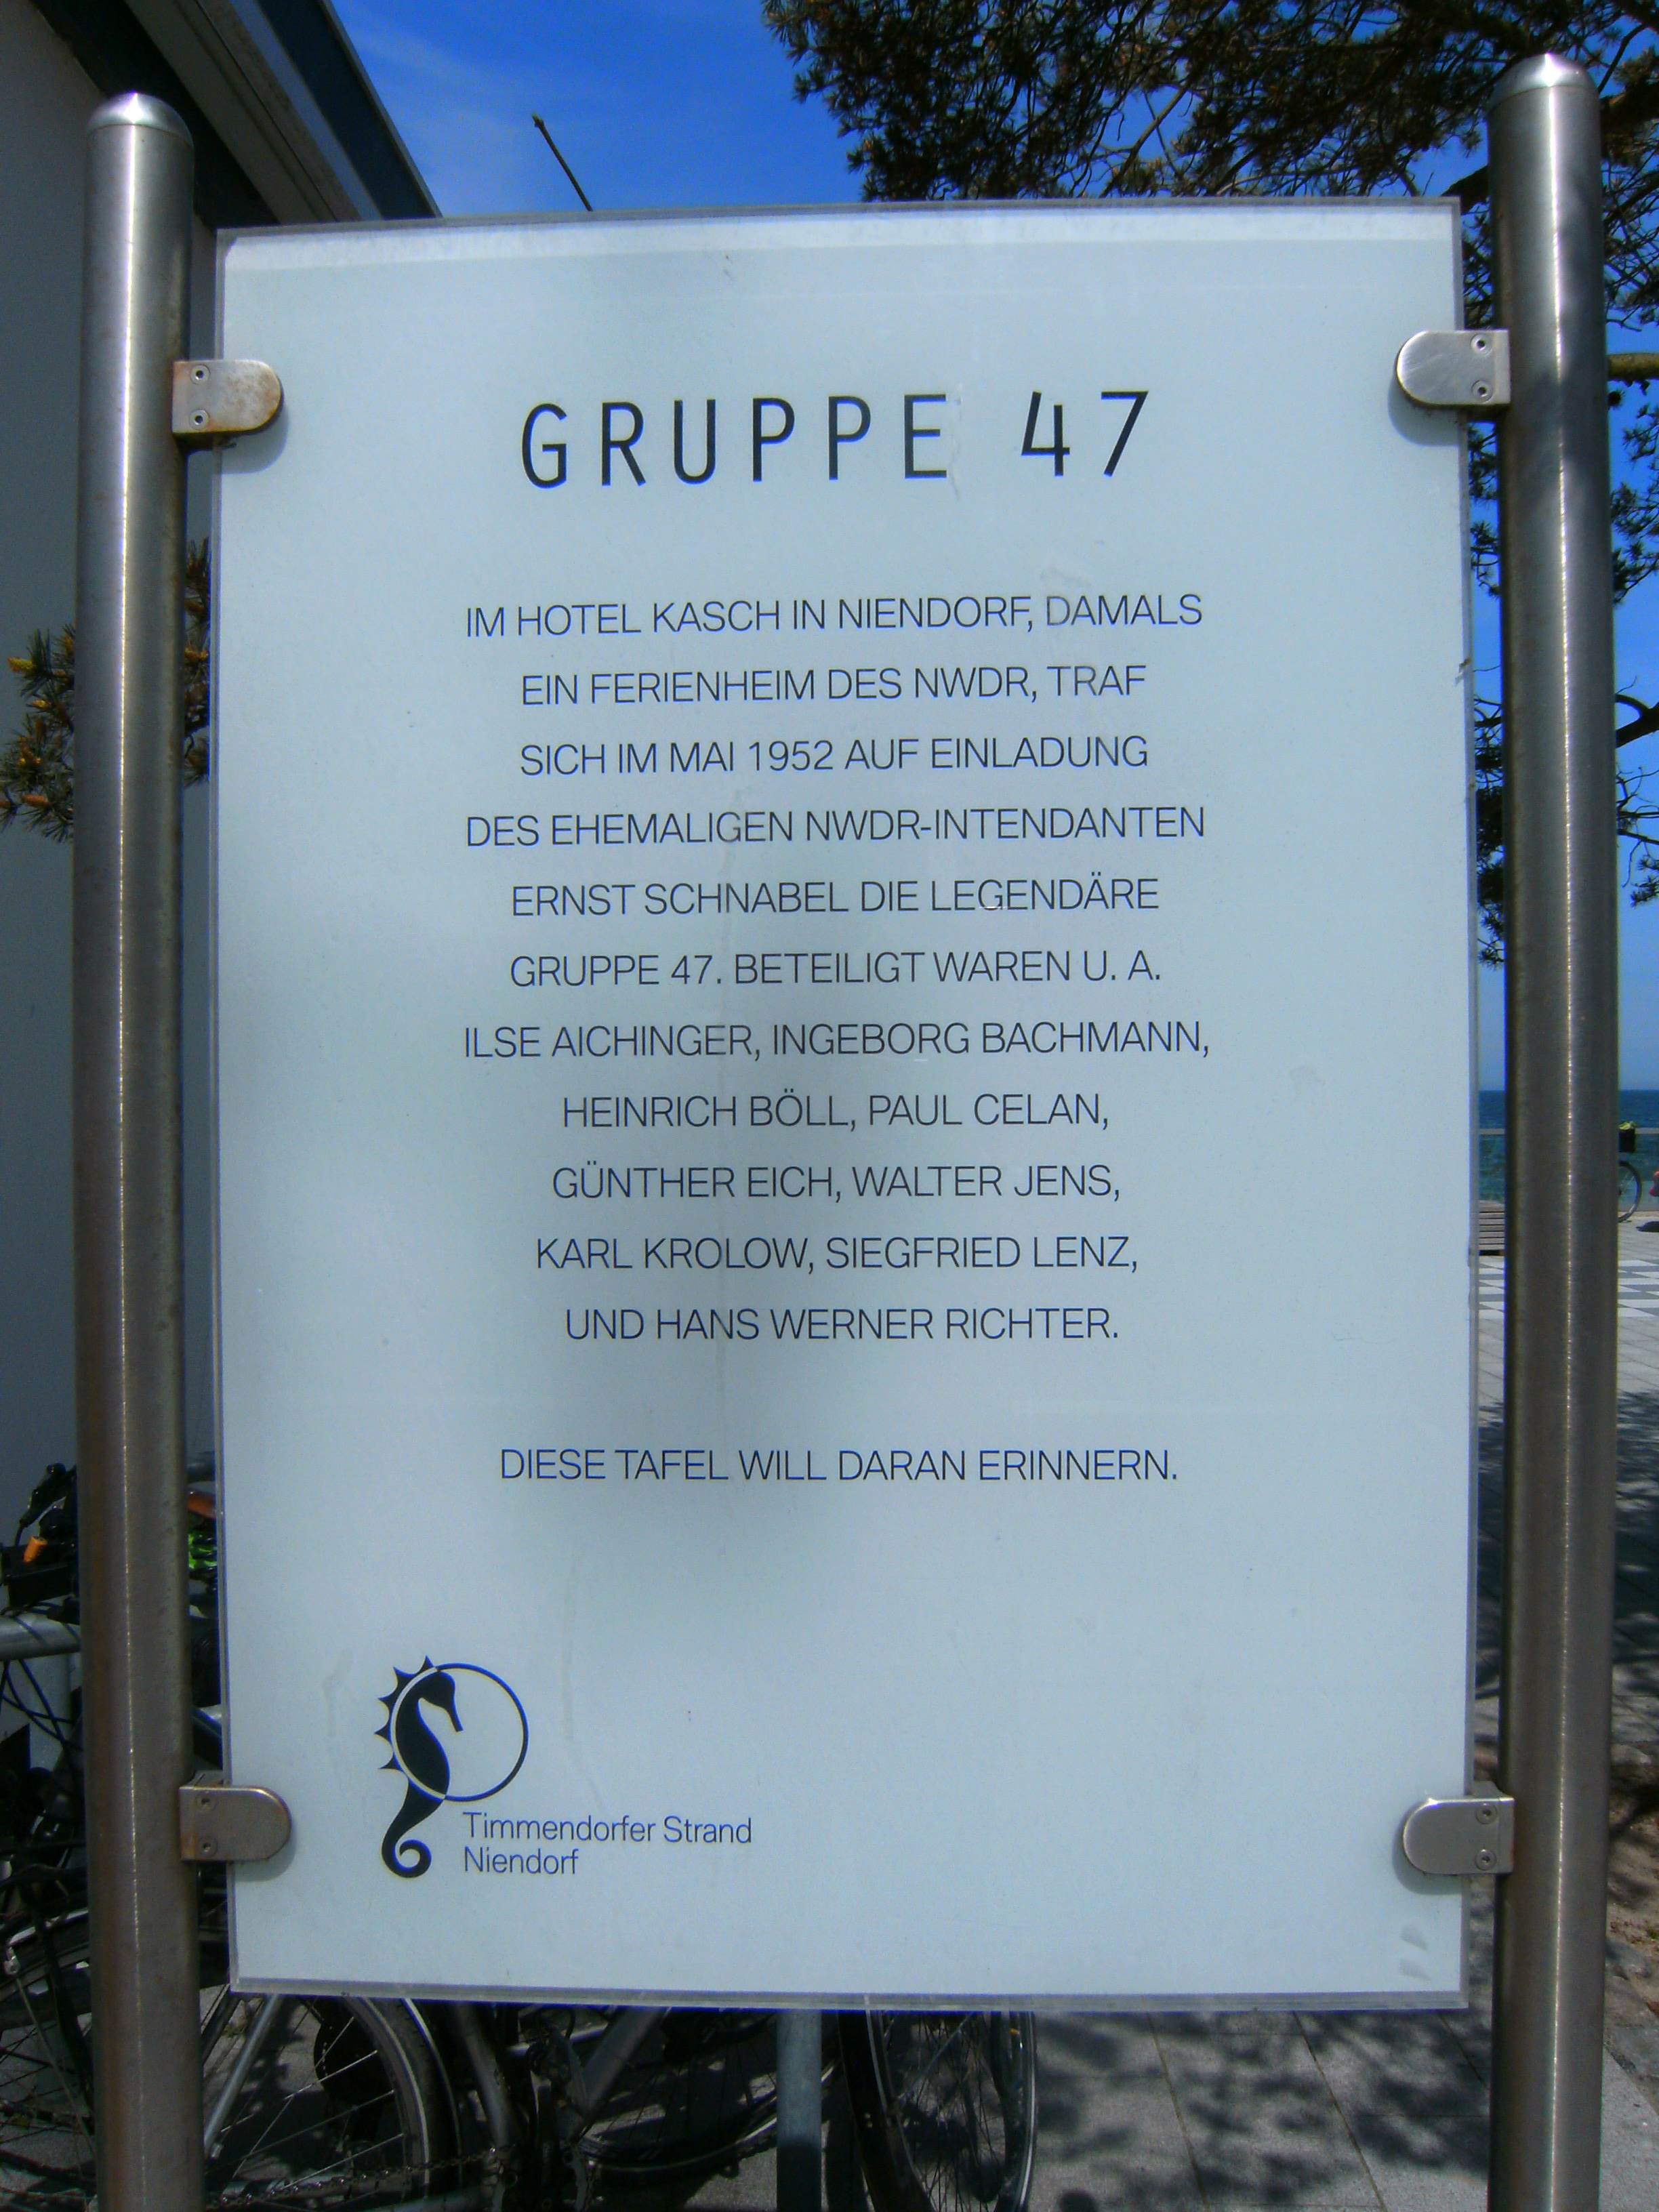 File Timmendorfer Strand Niendorf Promenade Gruppe 47 Plaque Jpg